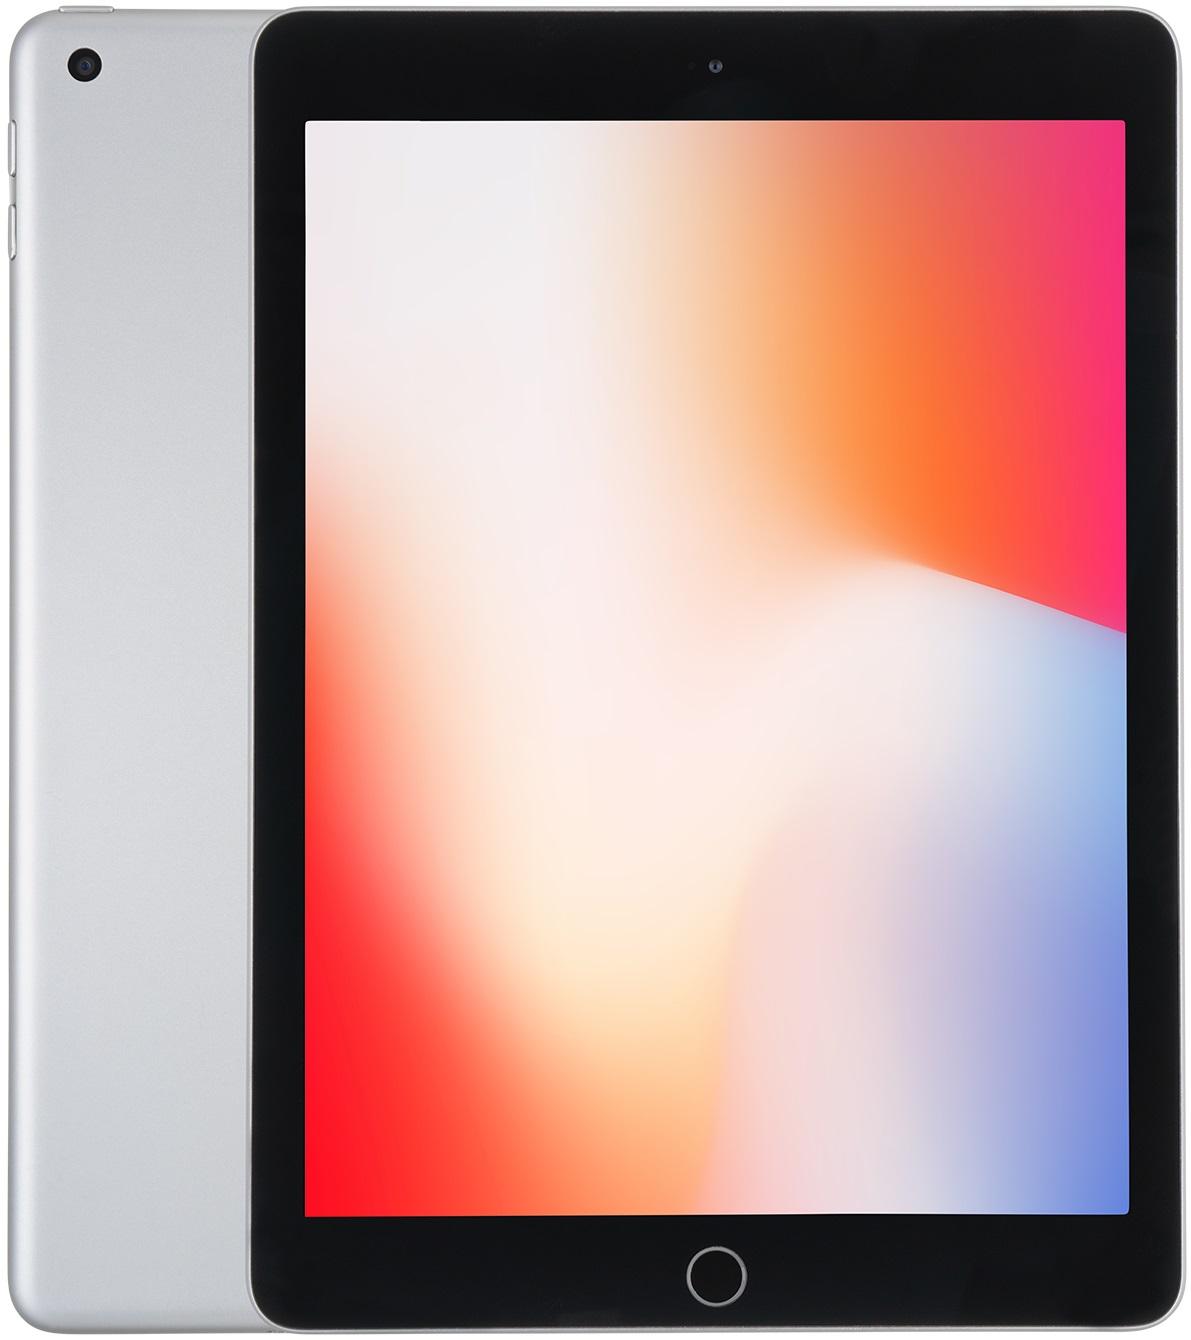 Apple iPad 9,7 128GB [Wi-Fi + Cellular, Modell 2018] silber